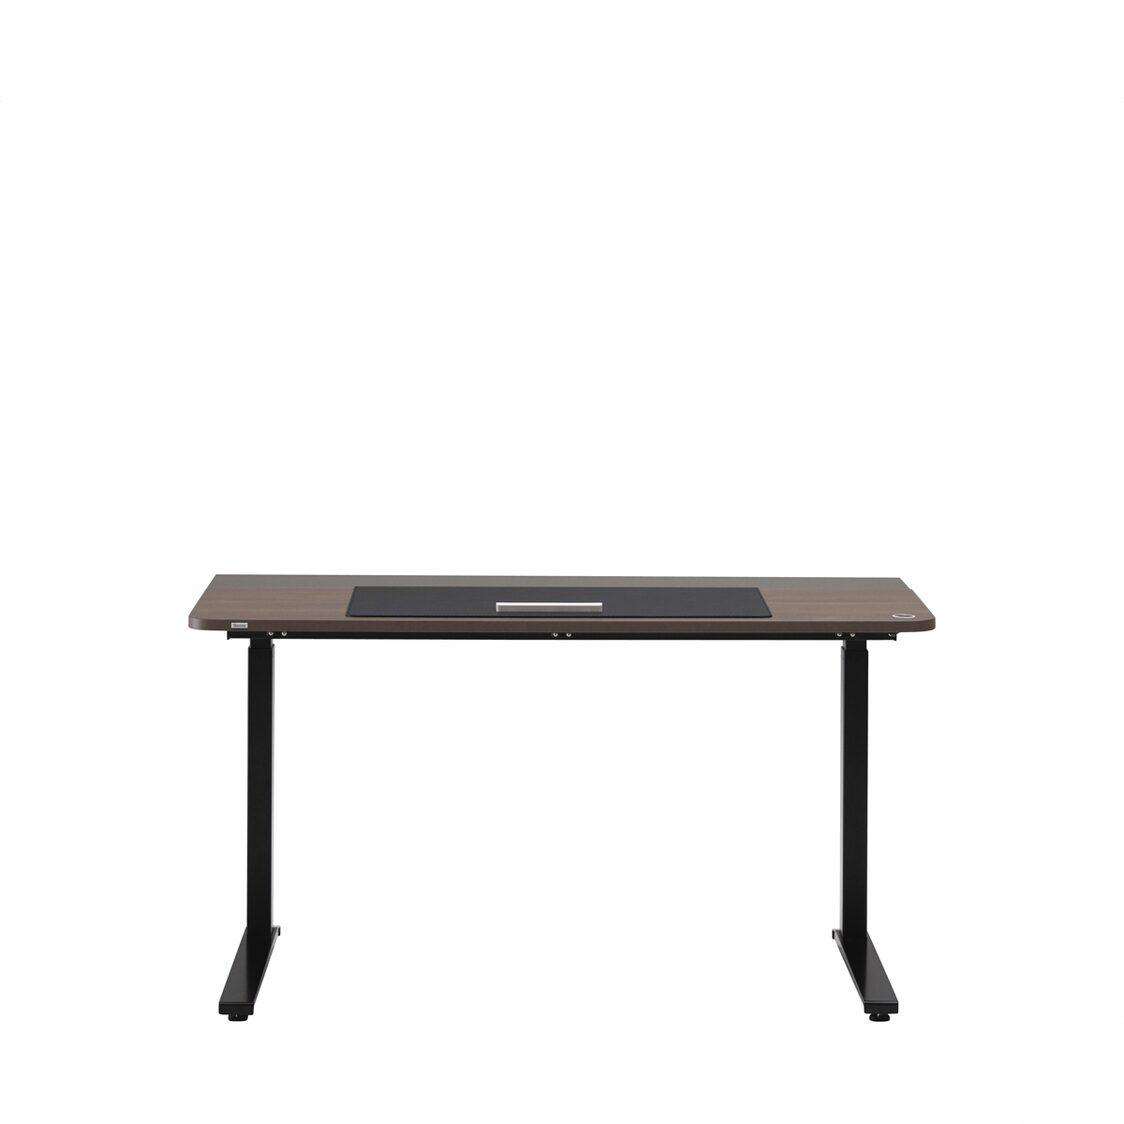 Iloom ITHACA-NEO Motion Desk HSMD114-UMDGM